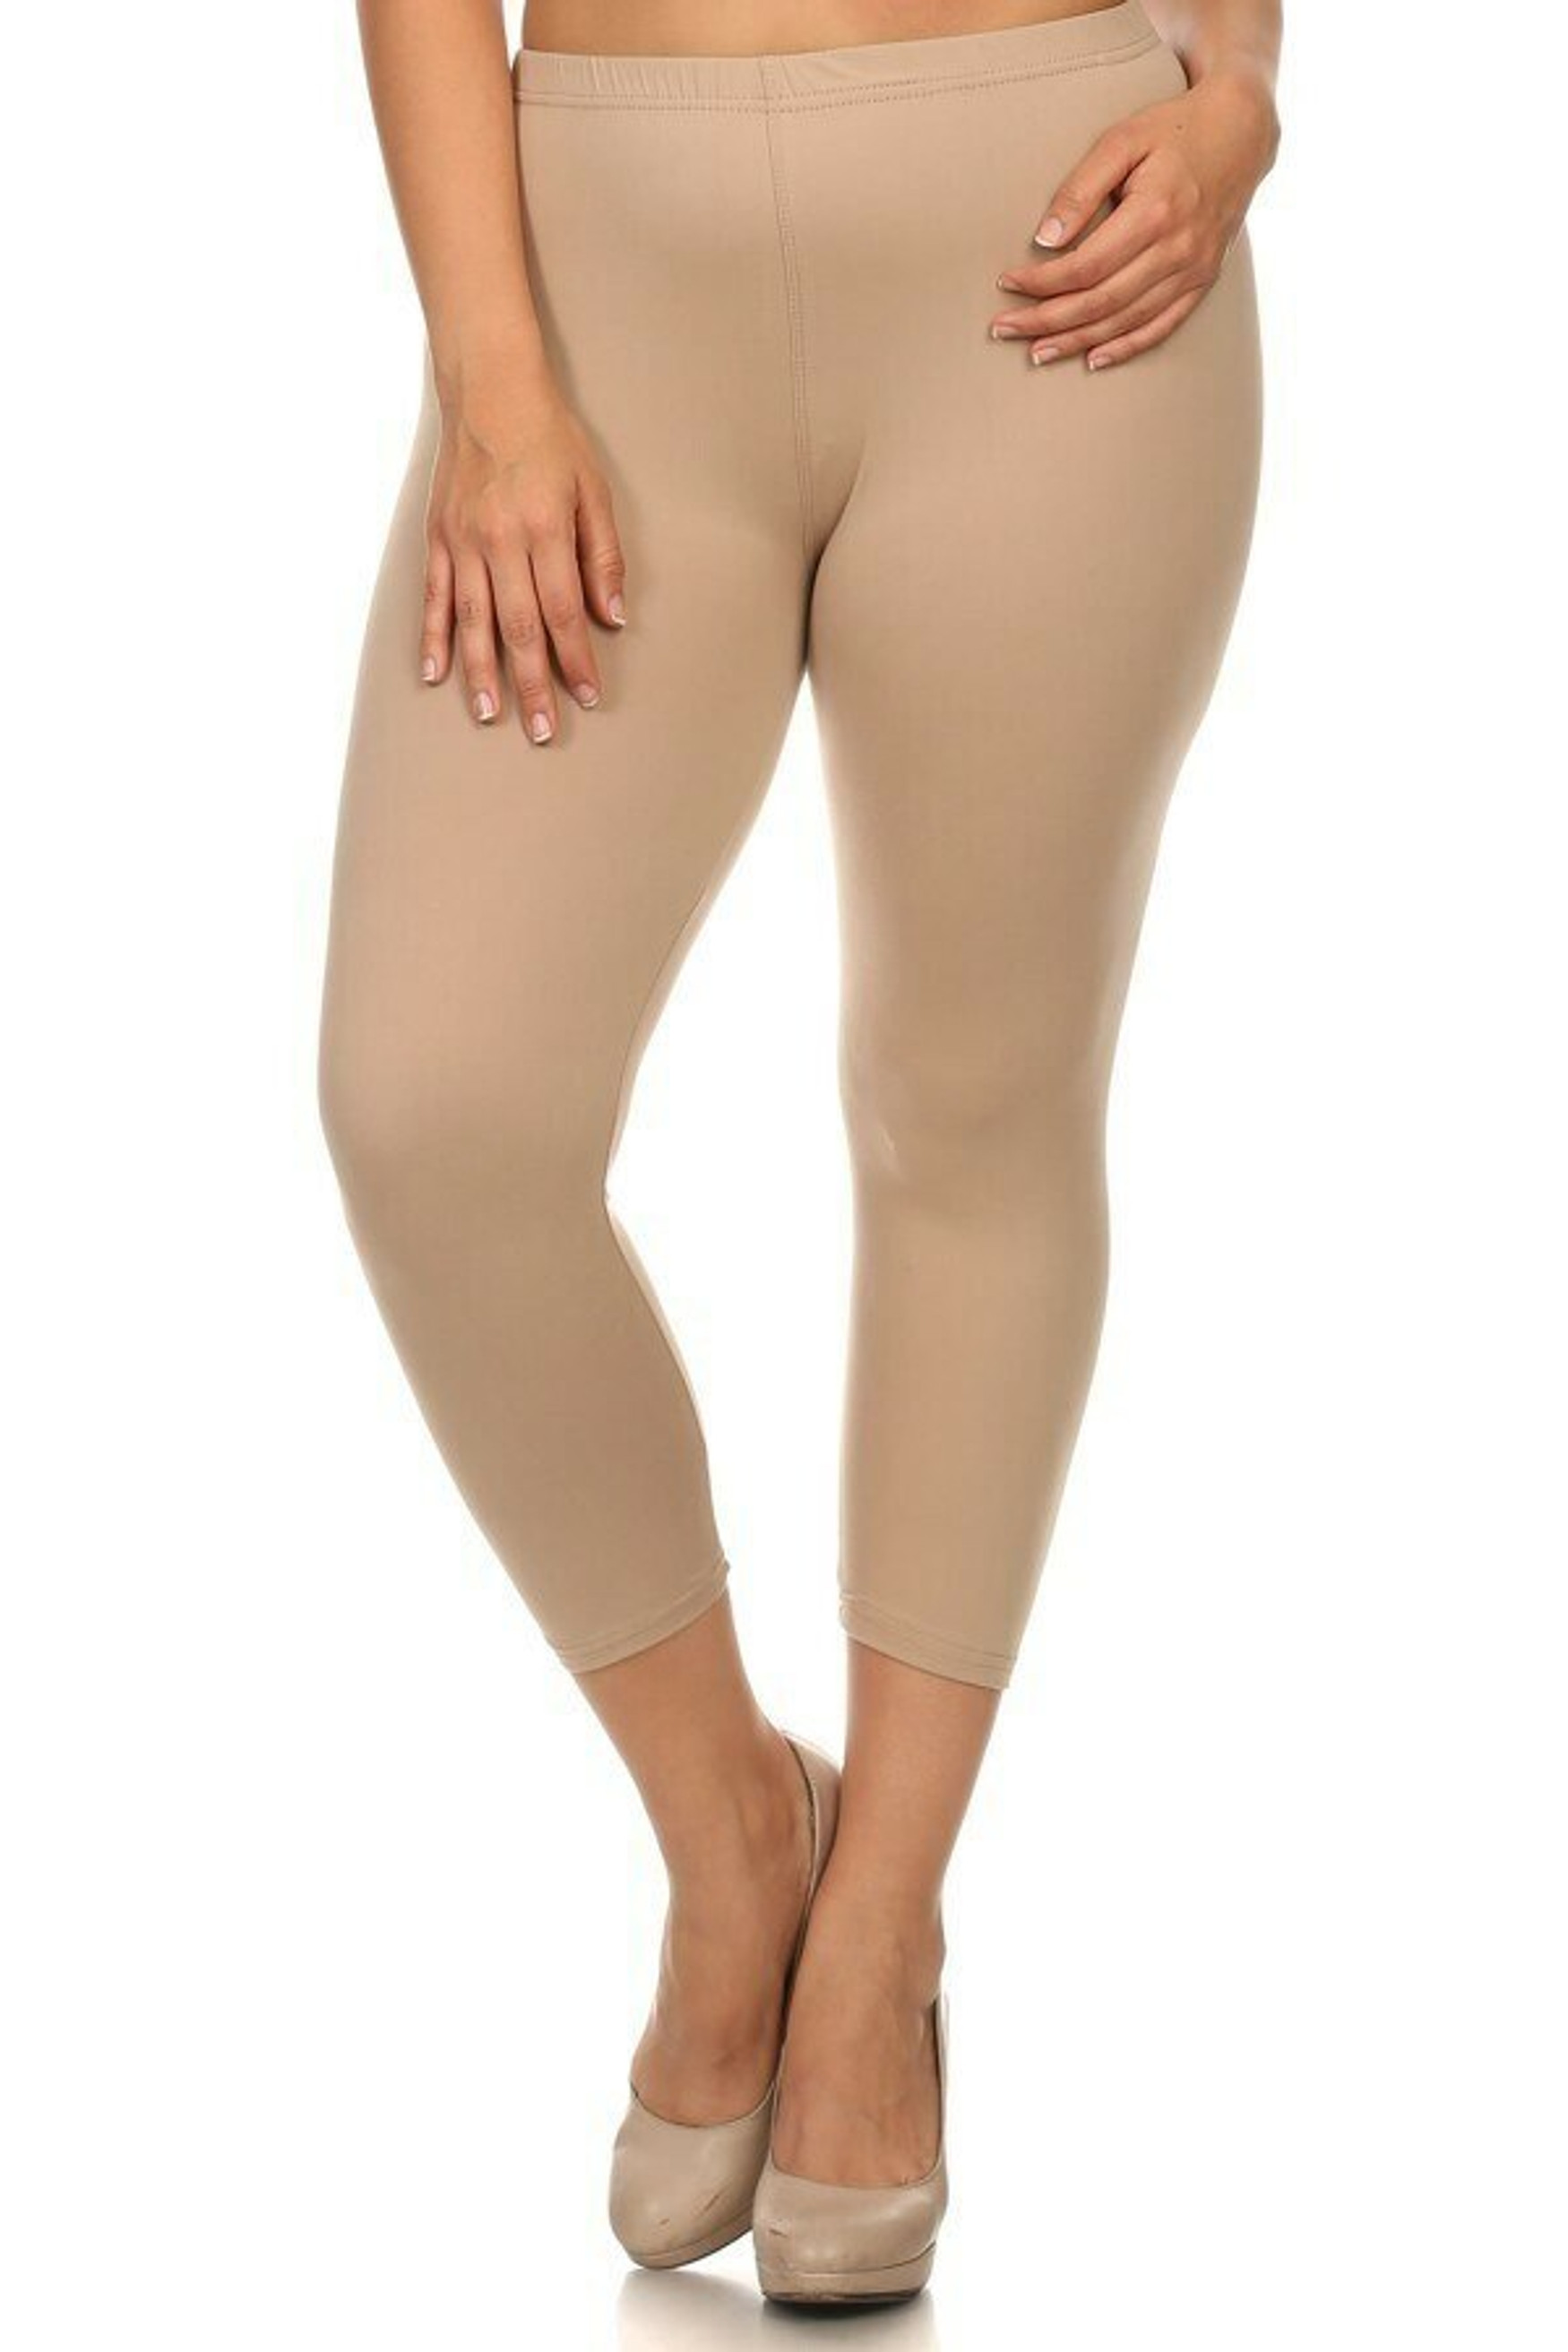 USA Cotton Capri Length Plus Size Leggings